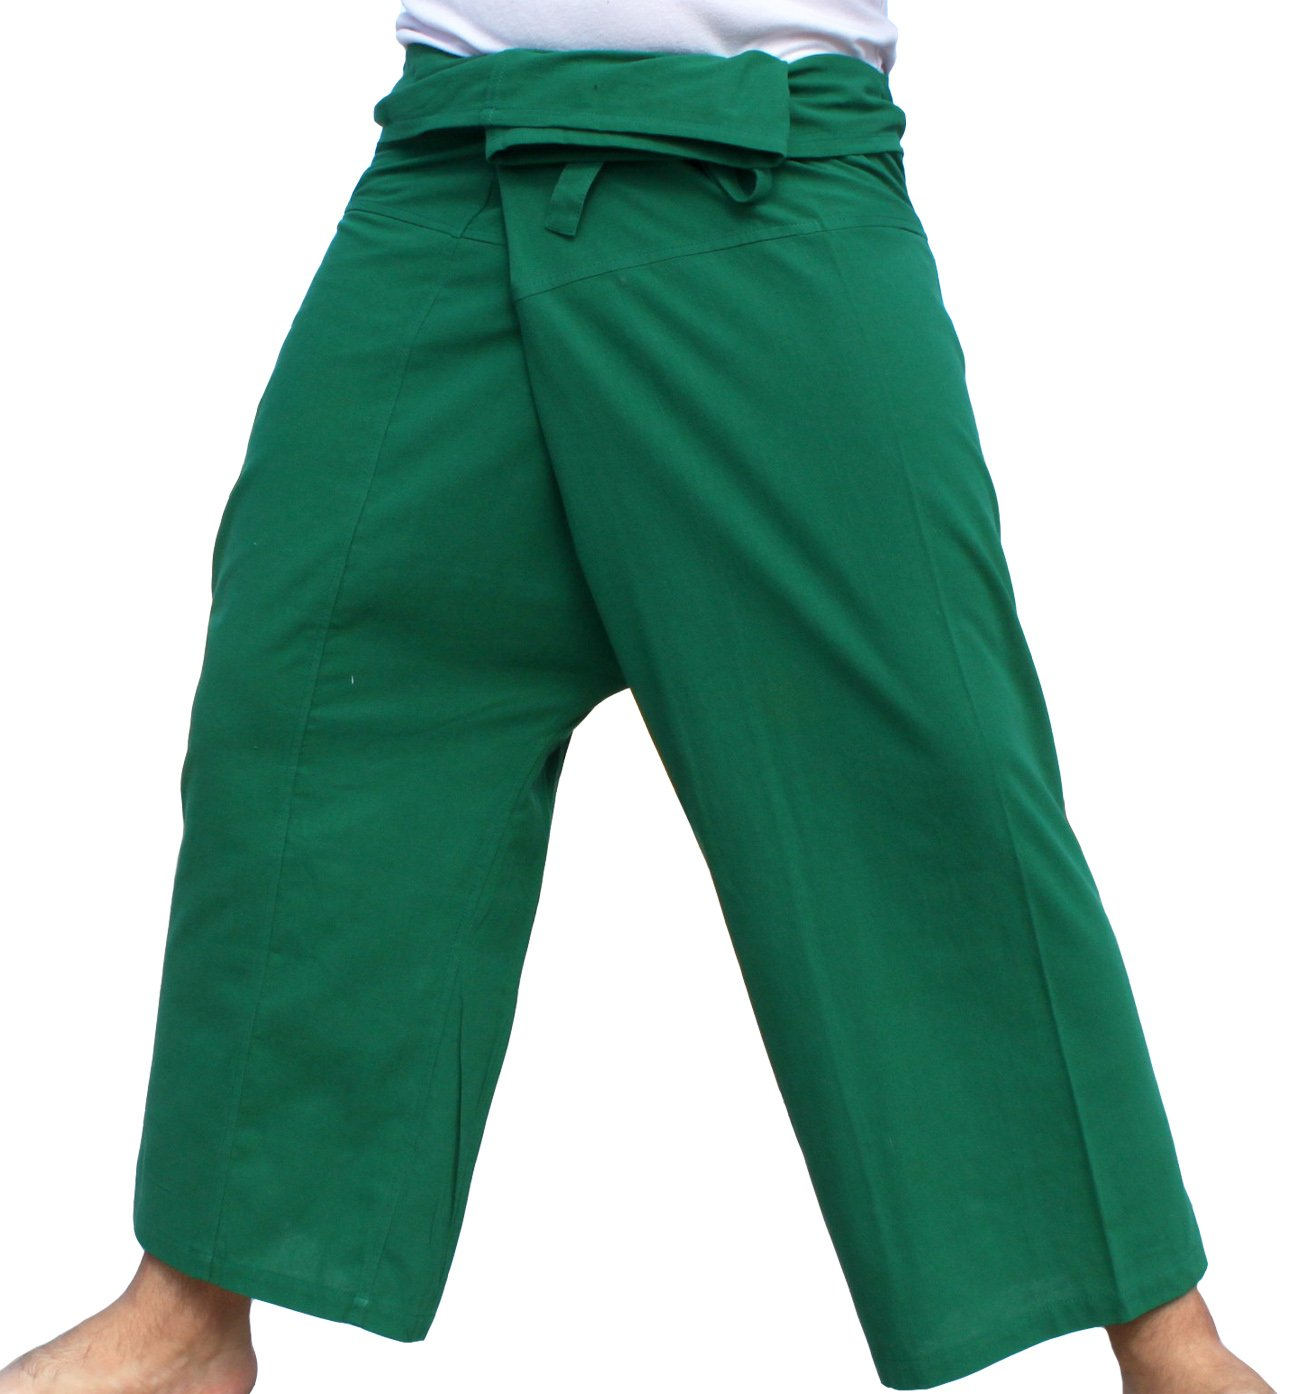 RaanPahMuang Brand Light Summer Cotton Thai Plain Fisherman Wrap Pants Tall Cut, Medium, Dartmouth Green by Raan Pah Muang